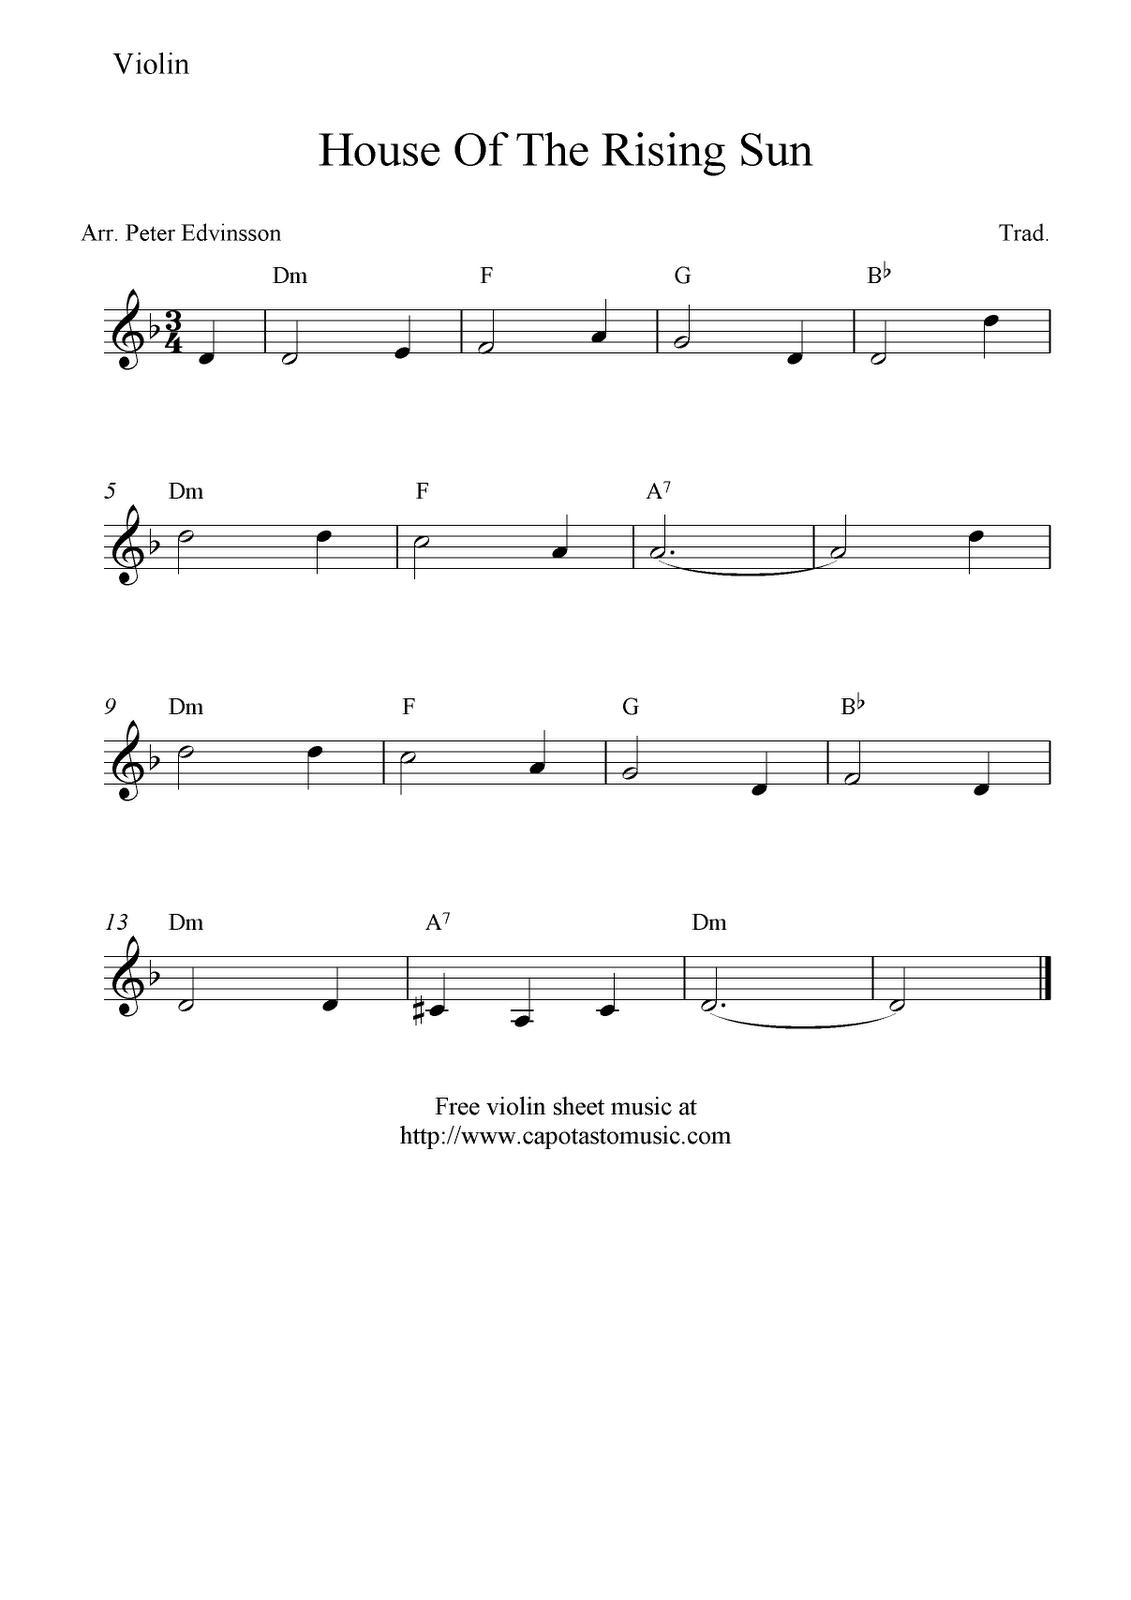 free violin sheet music | Free Sheet Music Scores: House Of The ...